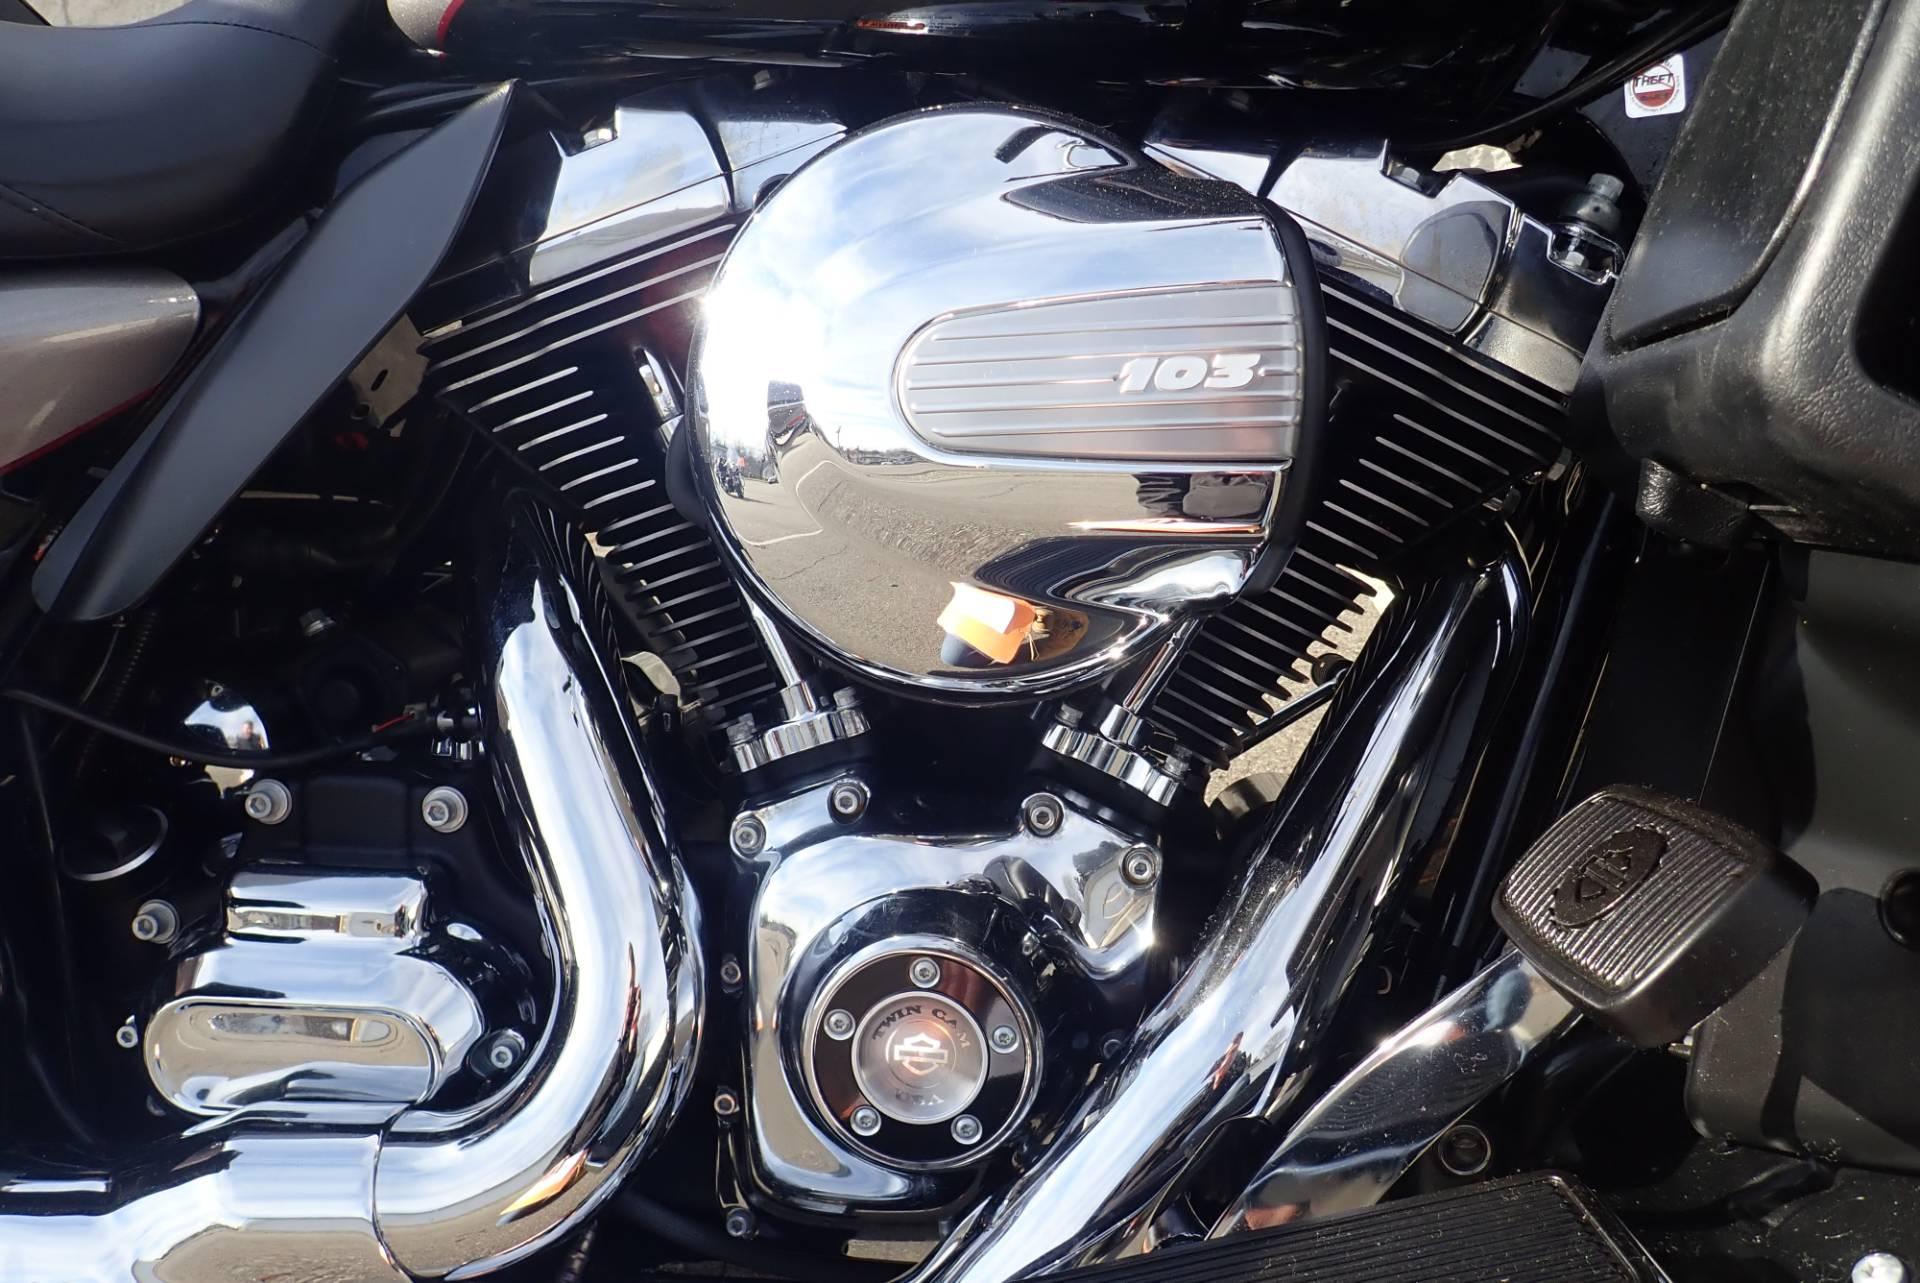 2016 Harley-Davidson Ultra Limited 4